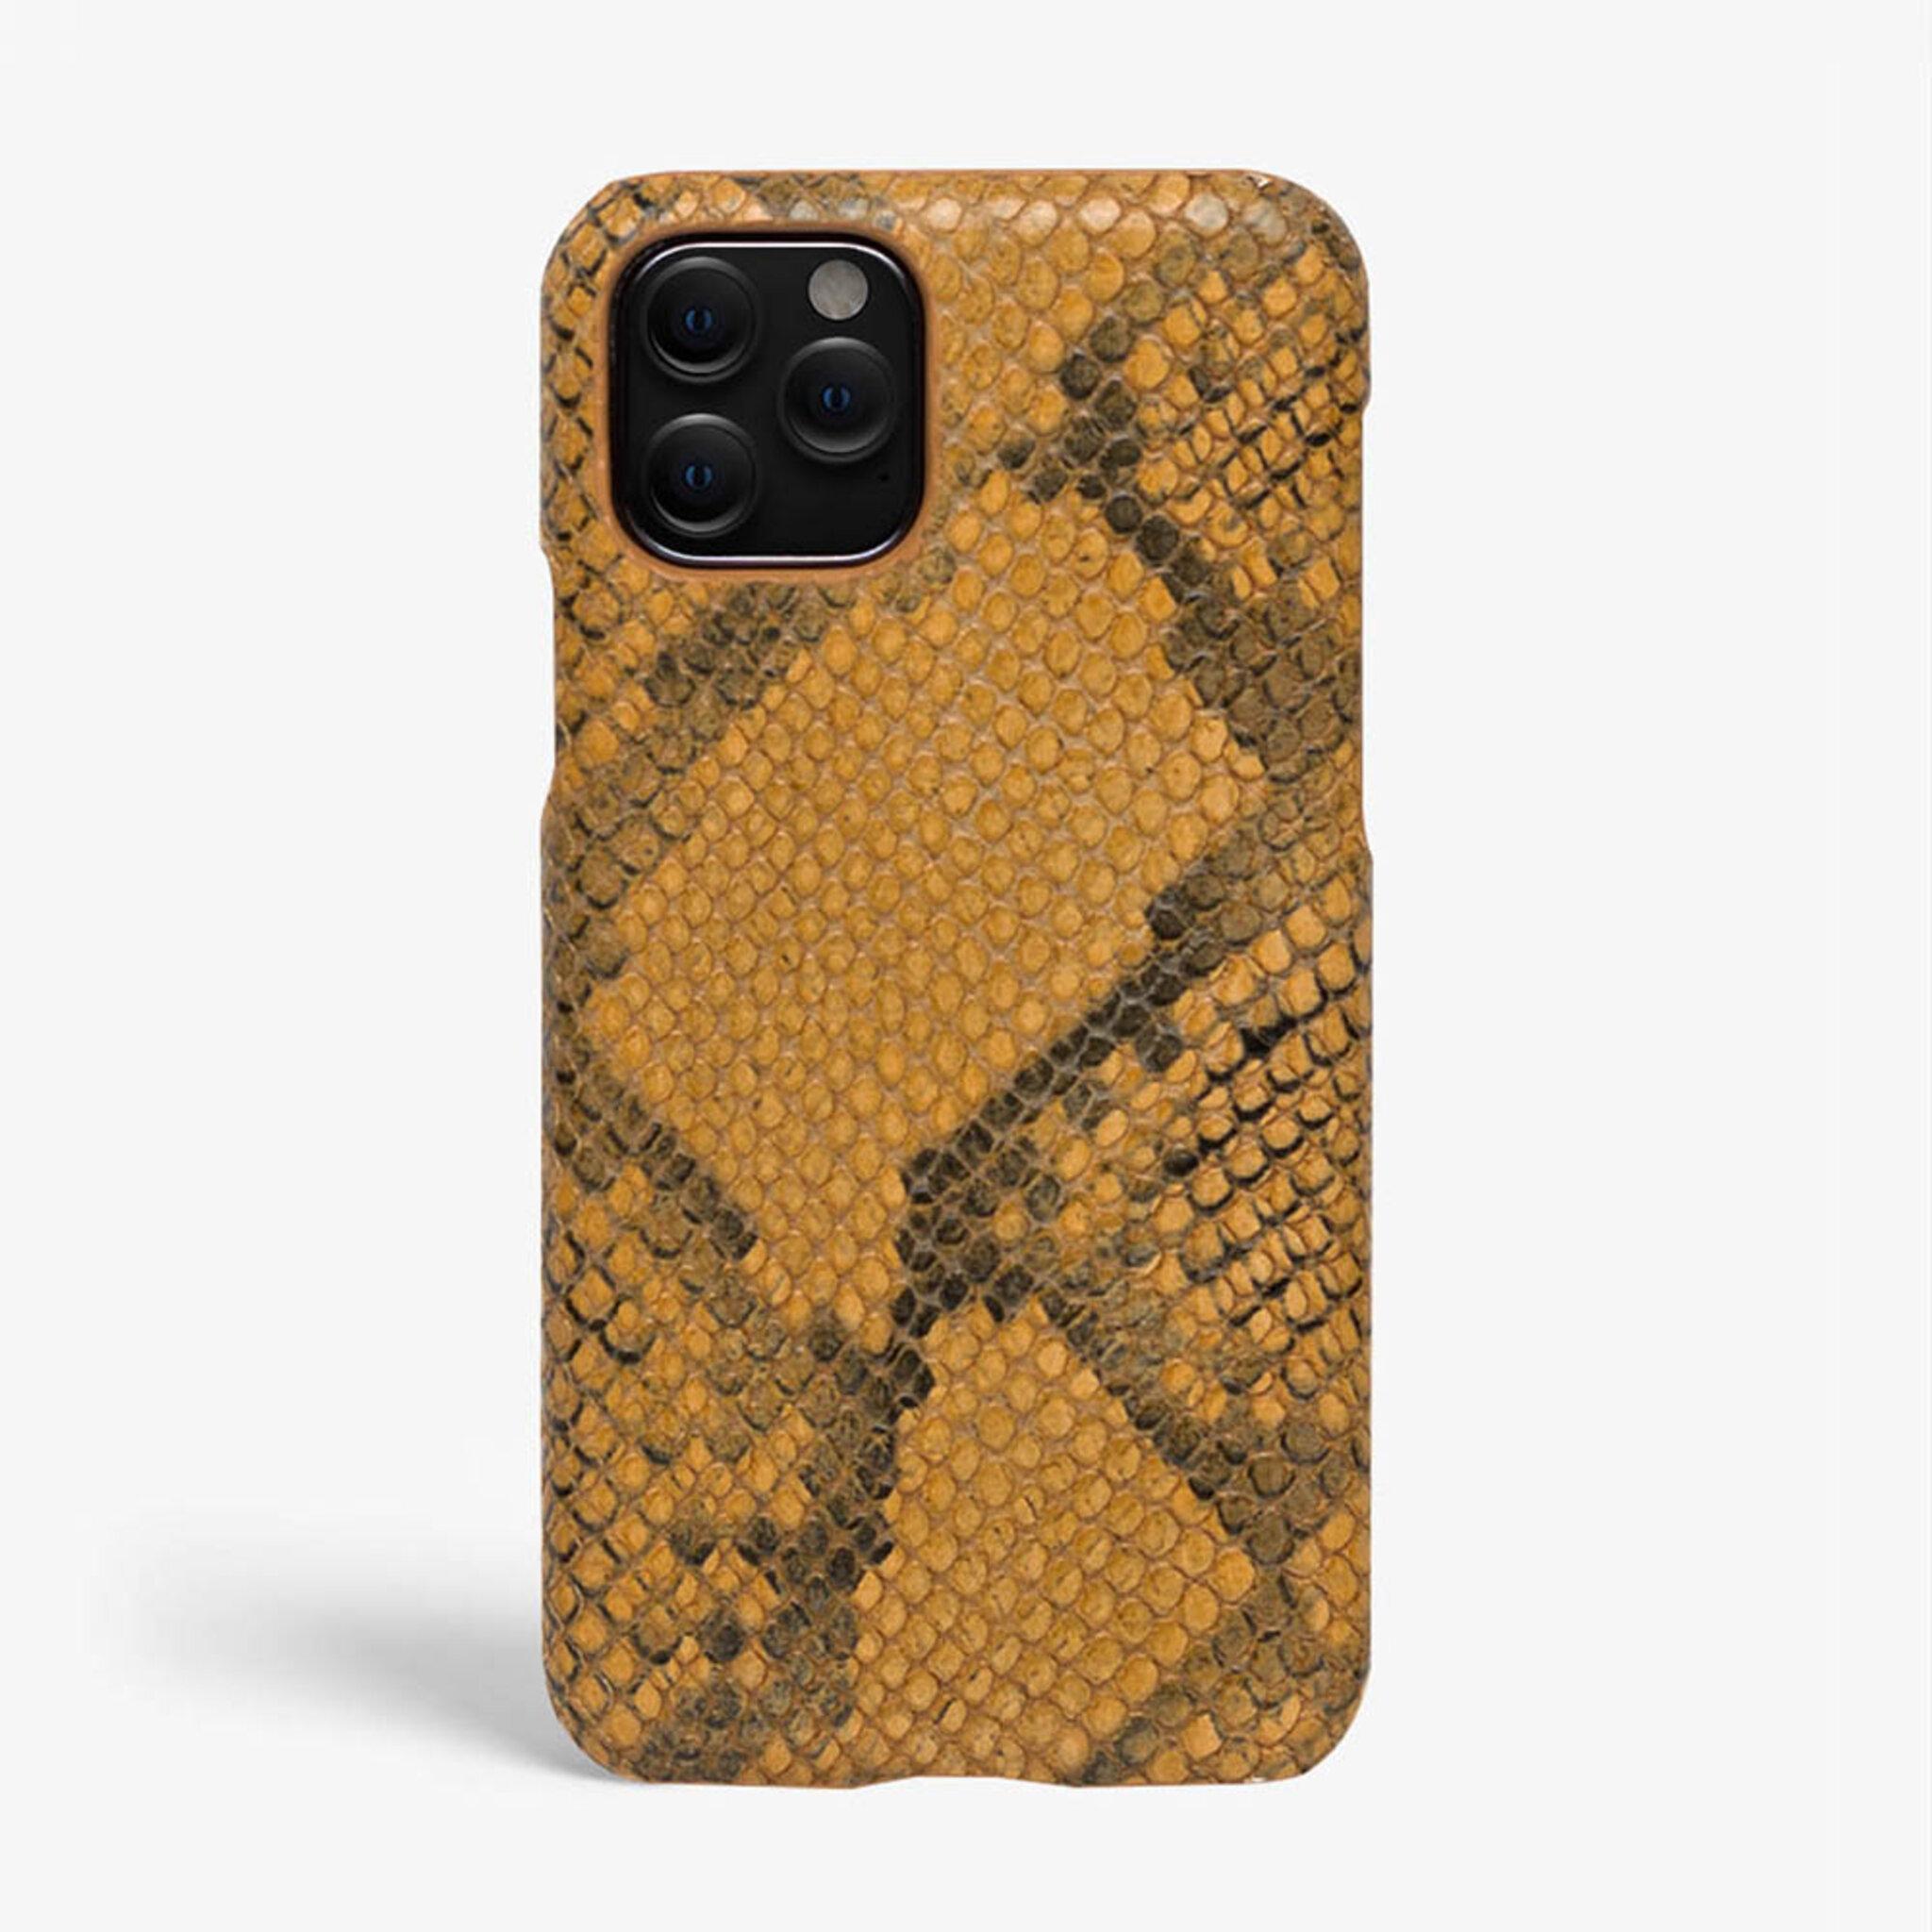 iPhone 11 Pro Snake